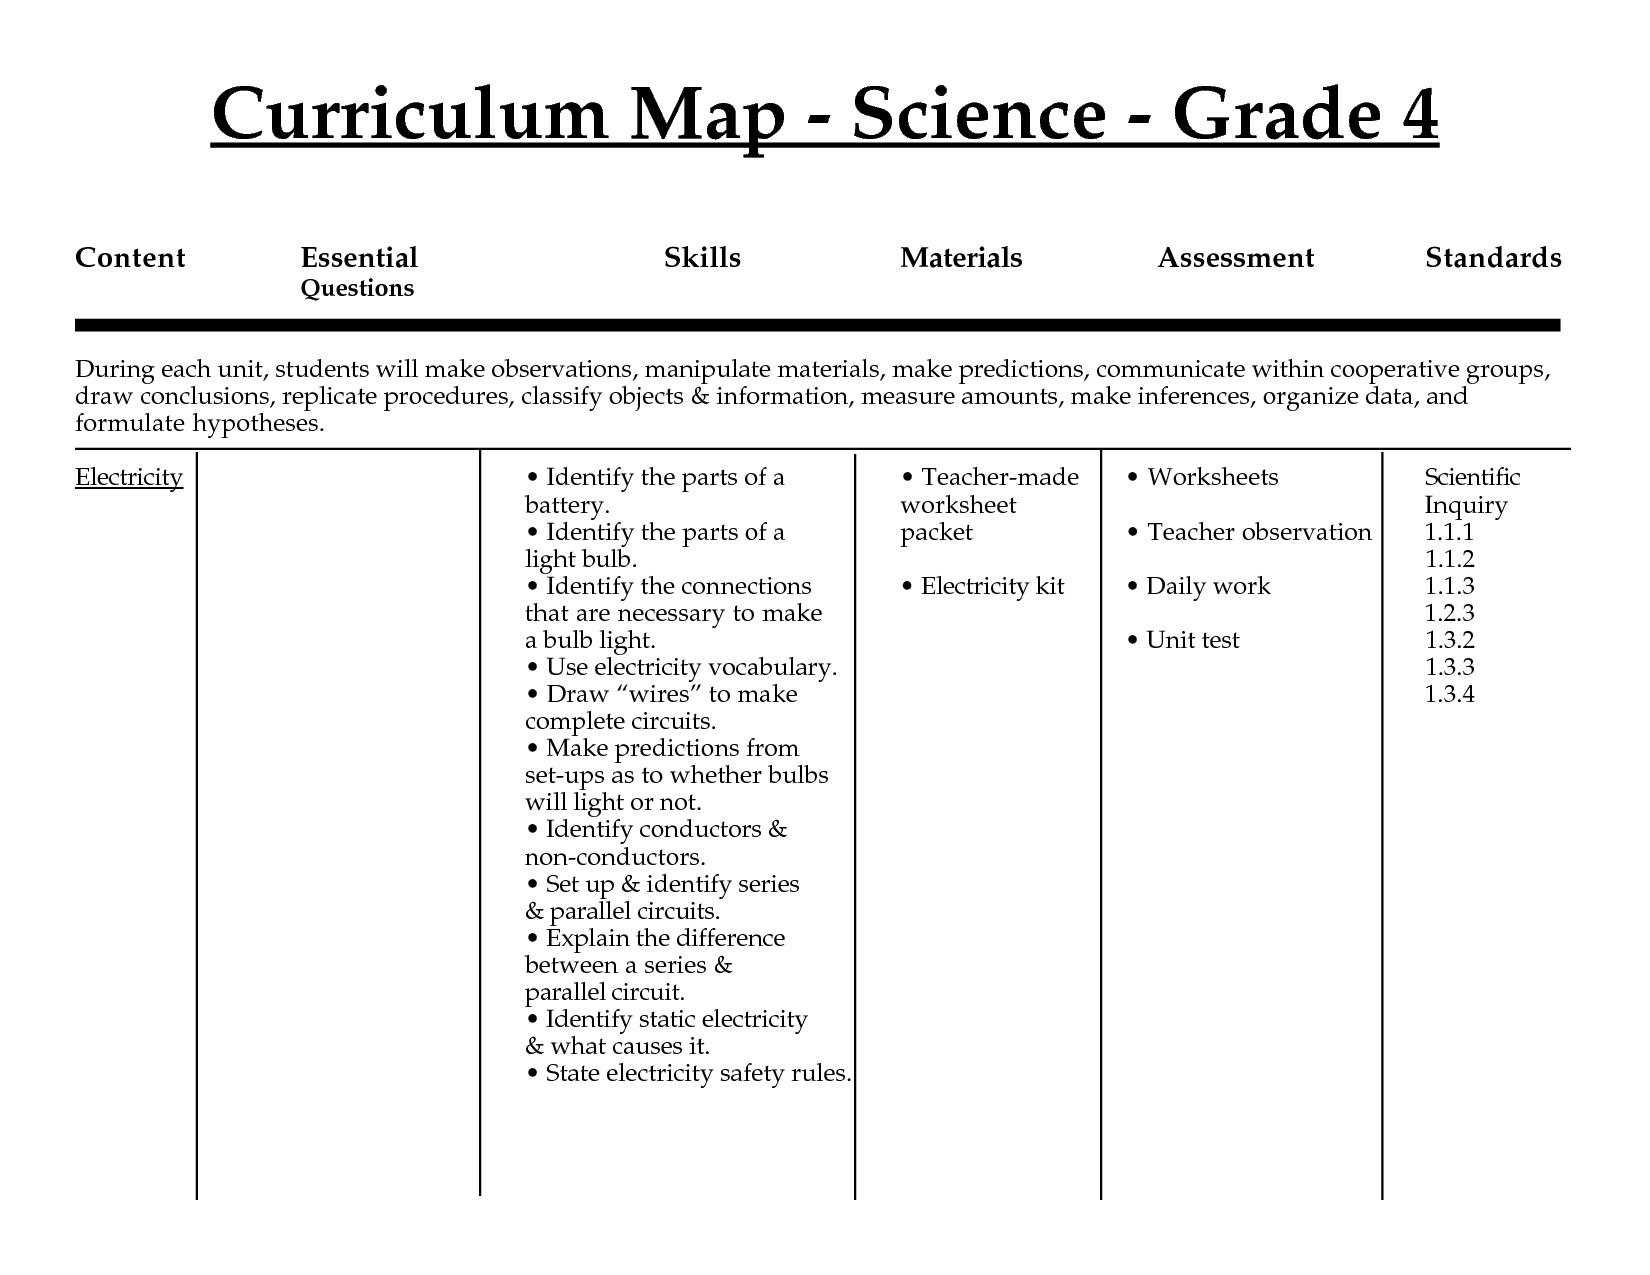 17 Best Images Of Science Worksheets For Grade 4